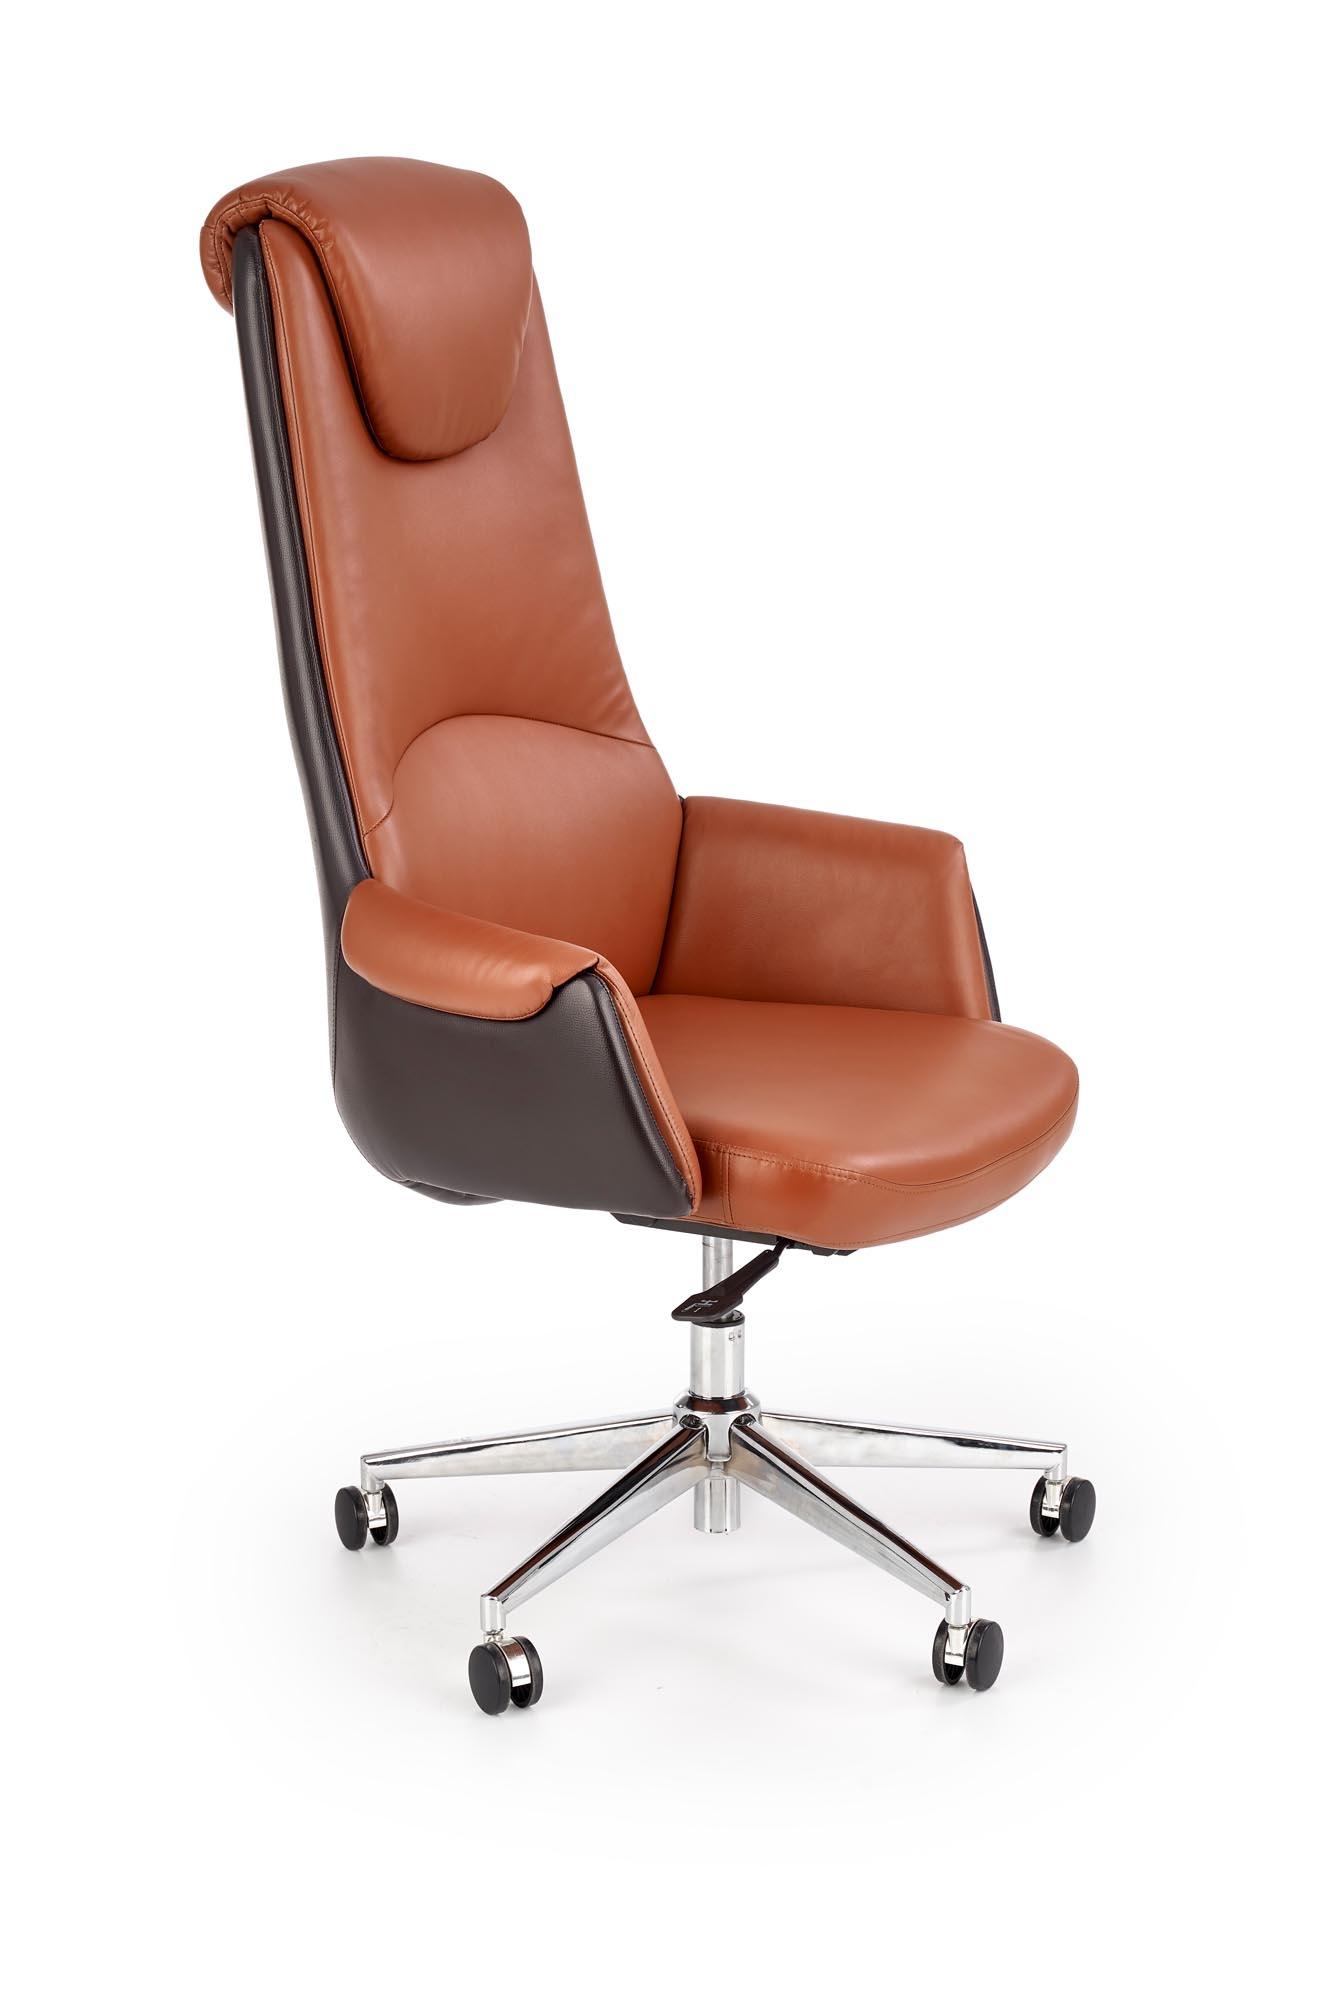 Scaun de birou ergonomic tapitat cu piele ecologica Calvano Maro, l73xA73xH120-130 cm